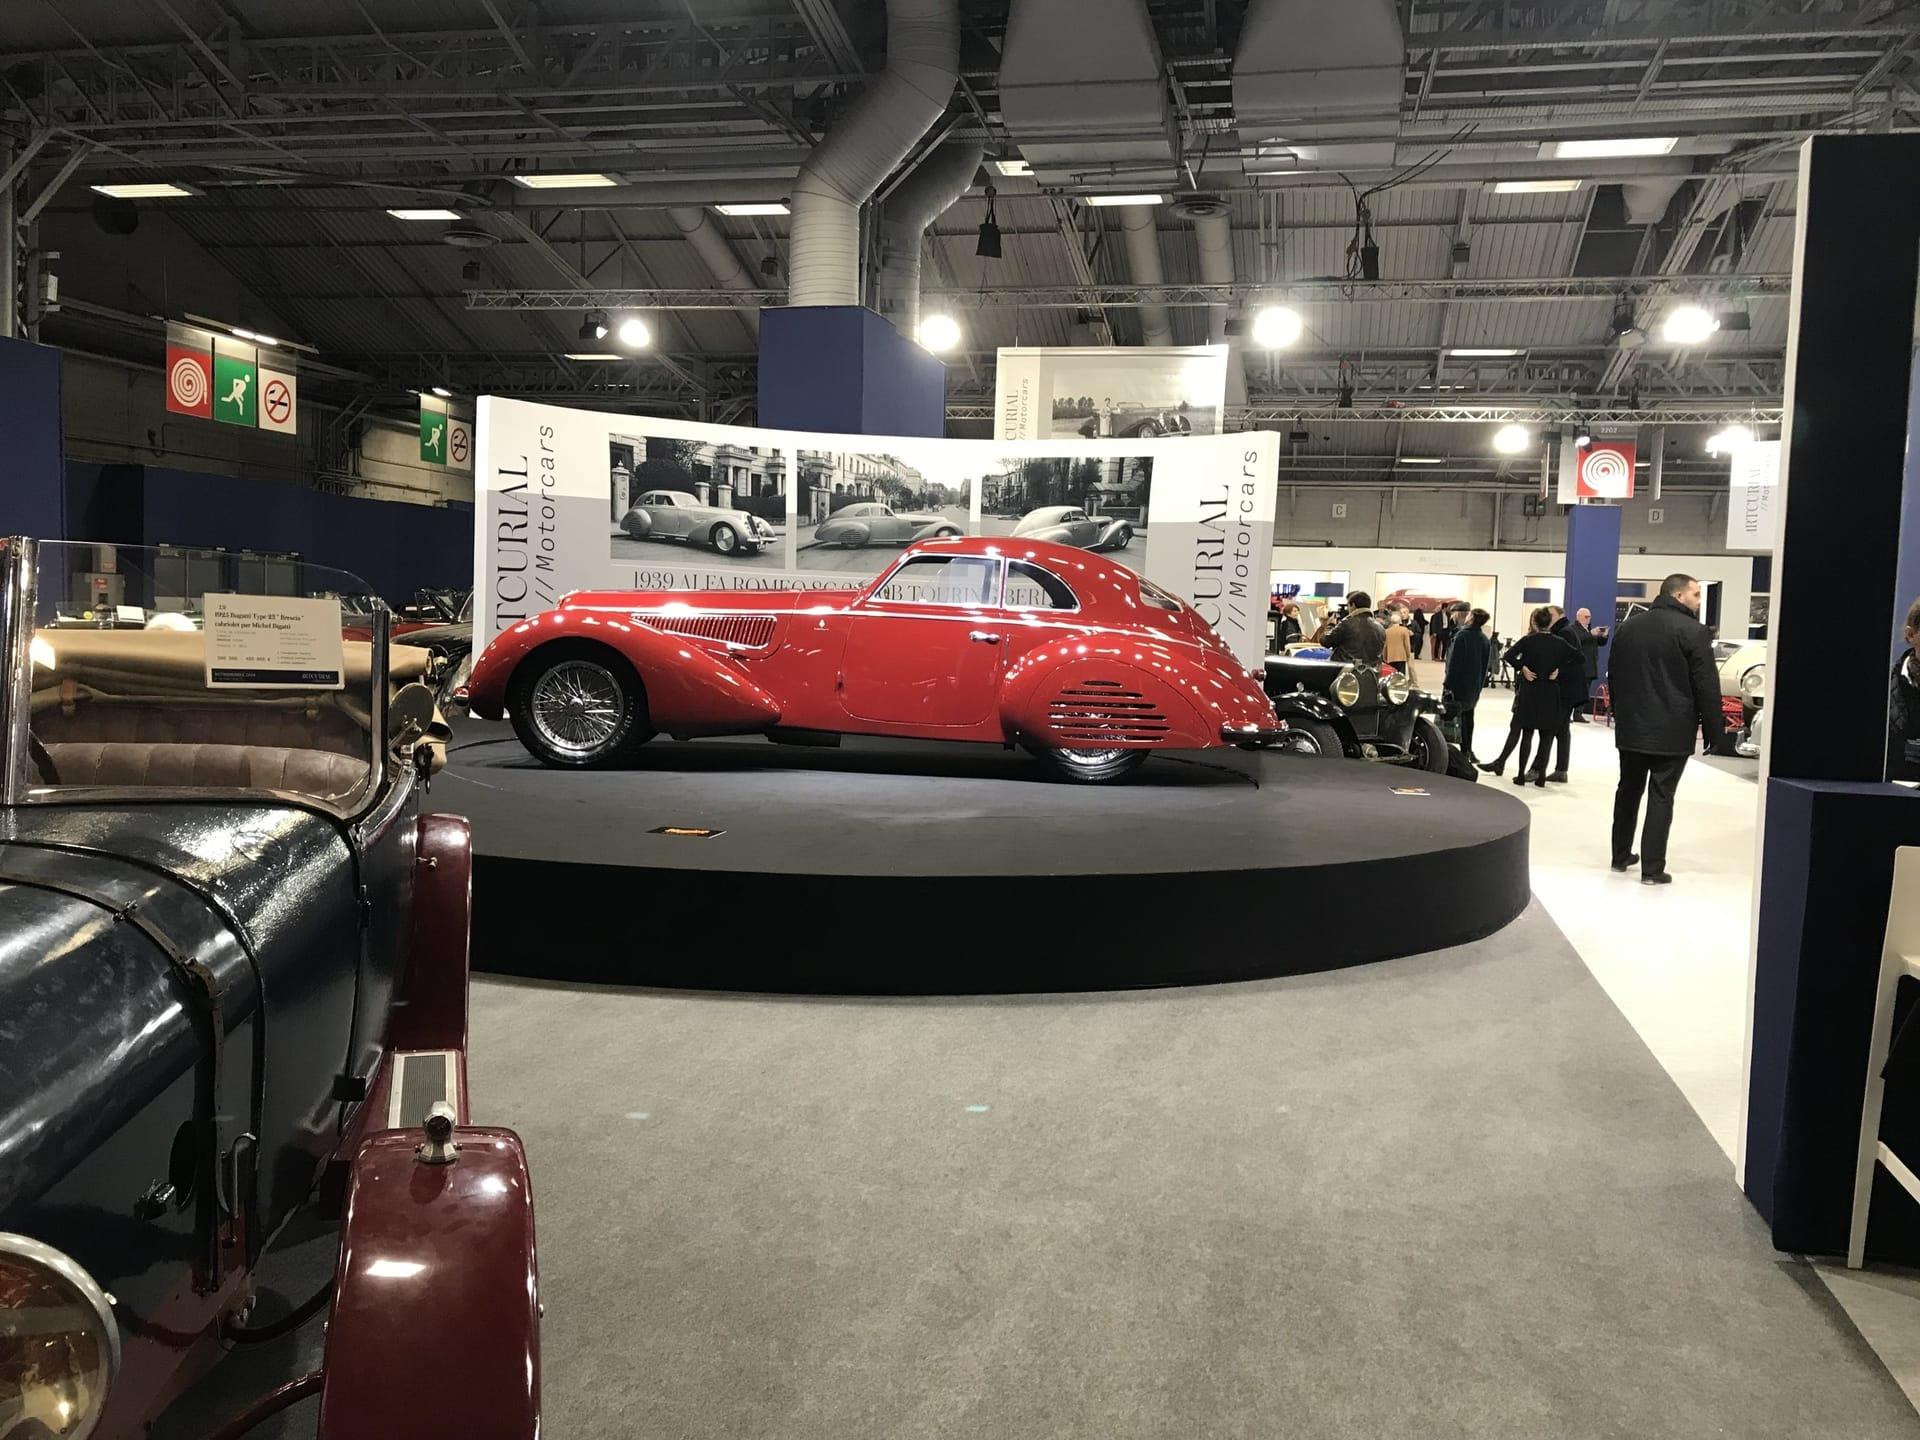 The 1939 Alfa Romeo 8C 2900B Touring Berlinetta for auction at 16-22 million euros.